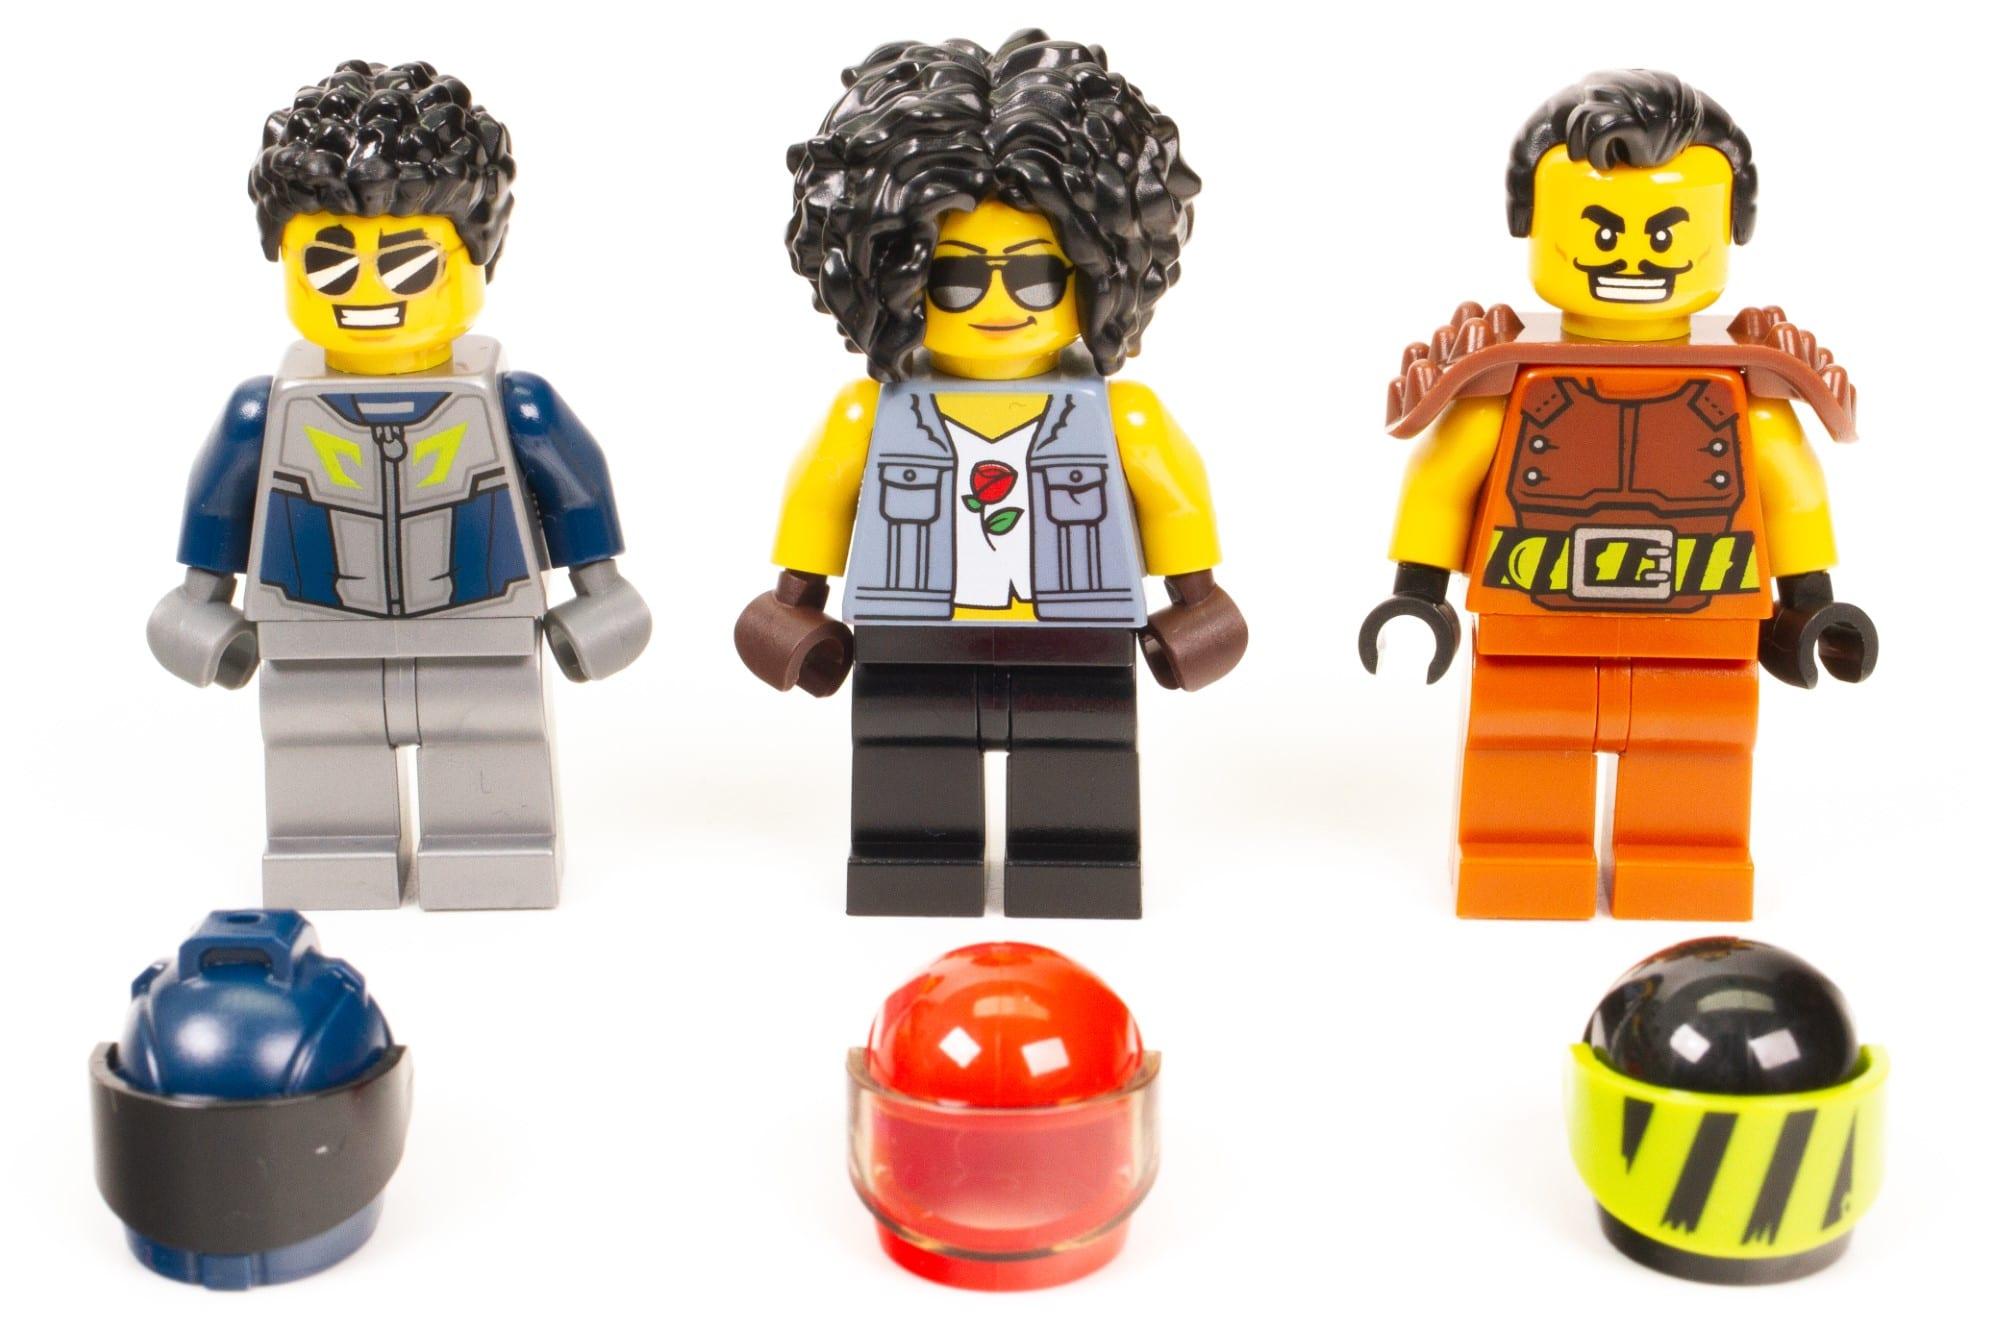 LEGO City Stuntz Praxistest Minifiguren 1